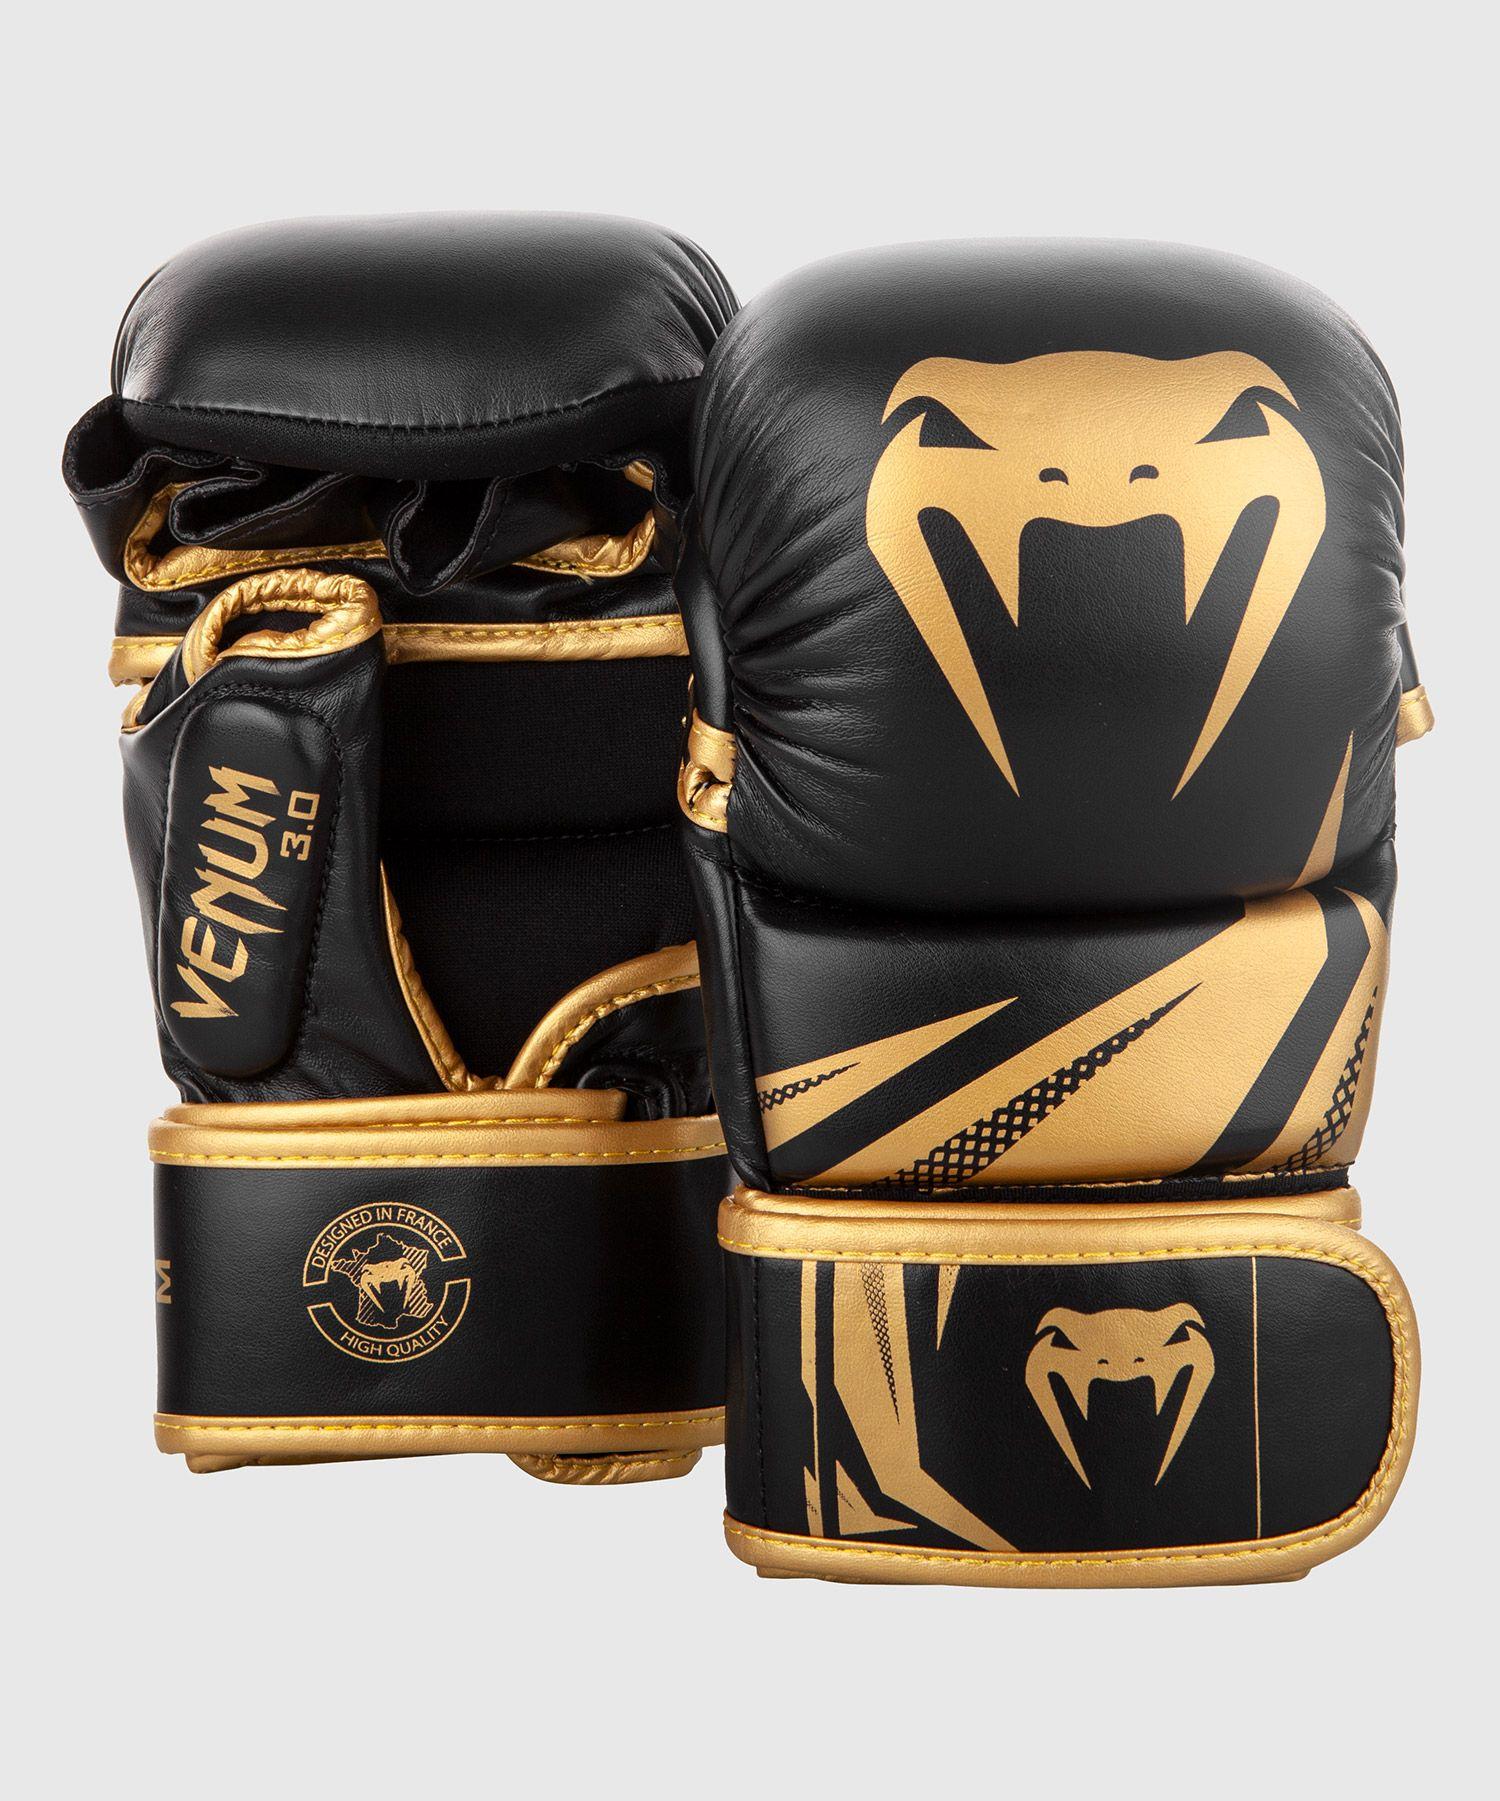 MMA HANDSCHUE SPARRING CHALLENGER 3.0 - Schwarz/Gold